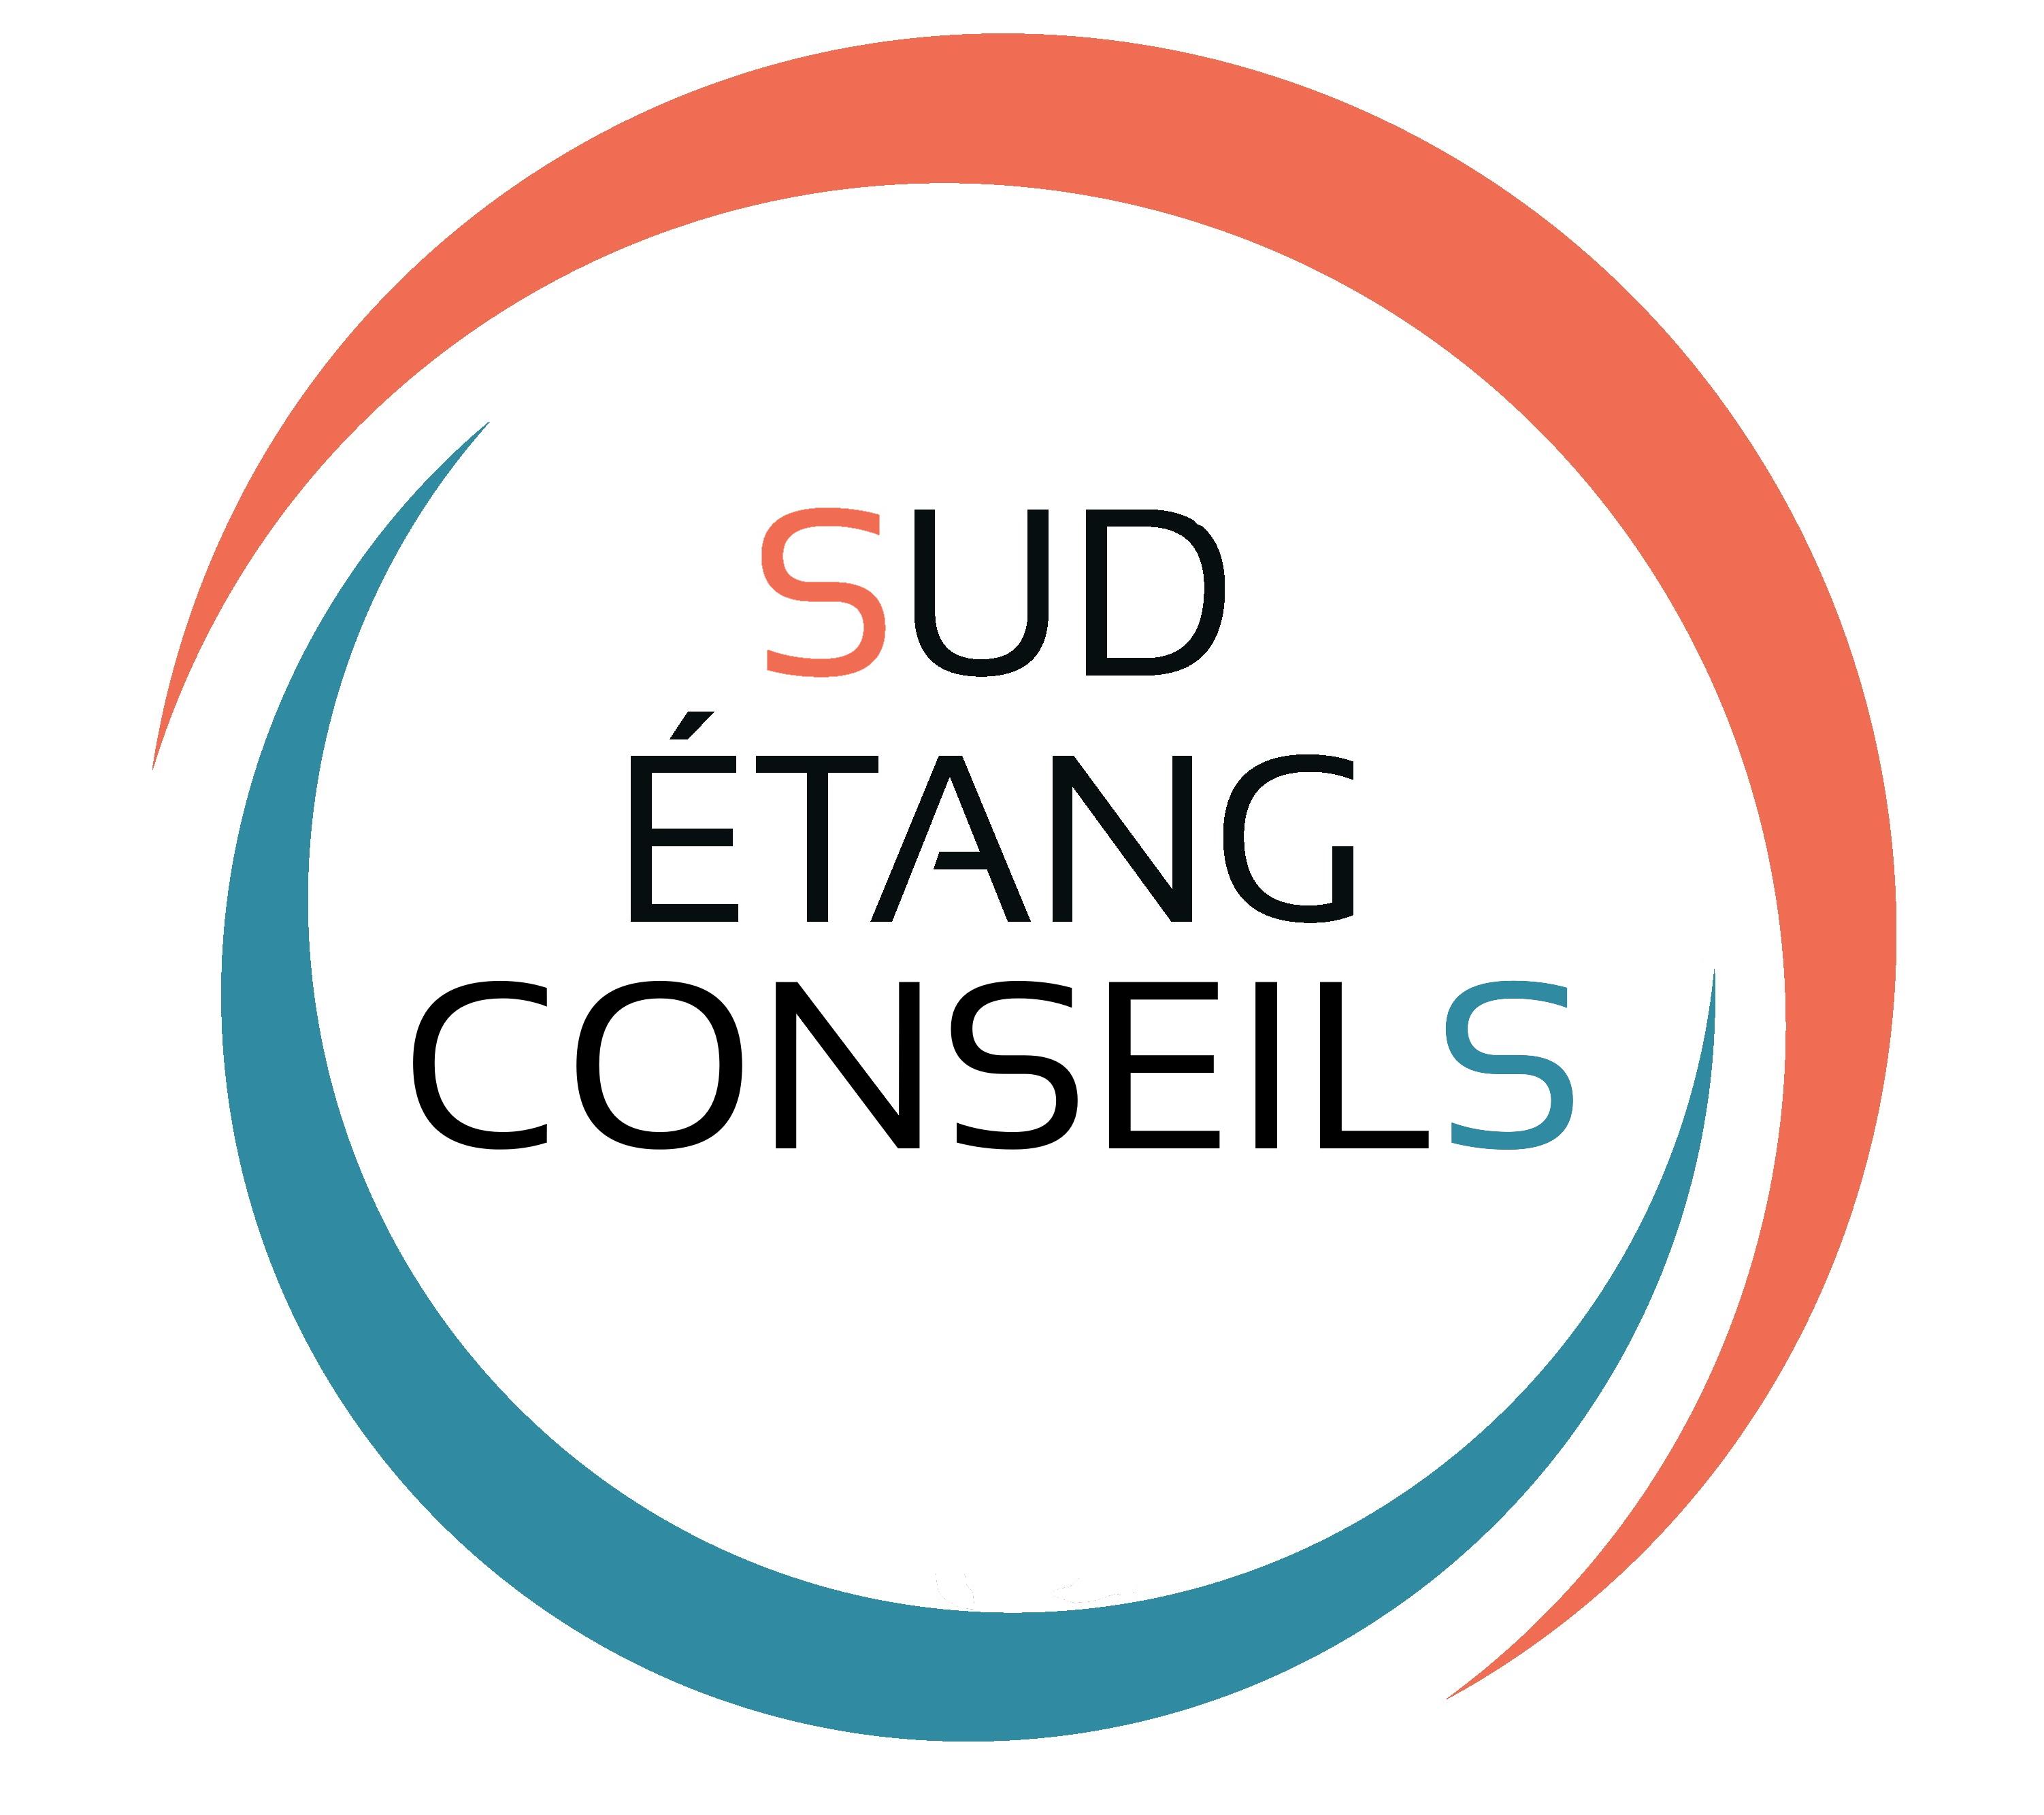 logo SUD ETANG CONSEILS (002)